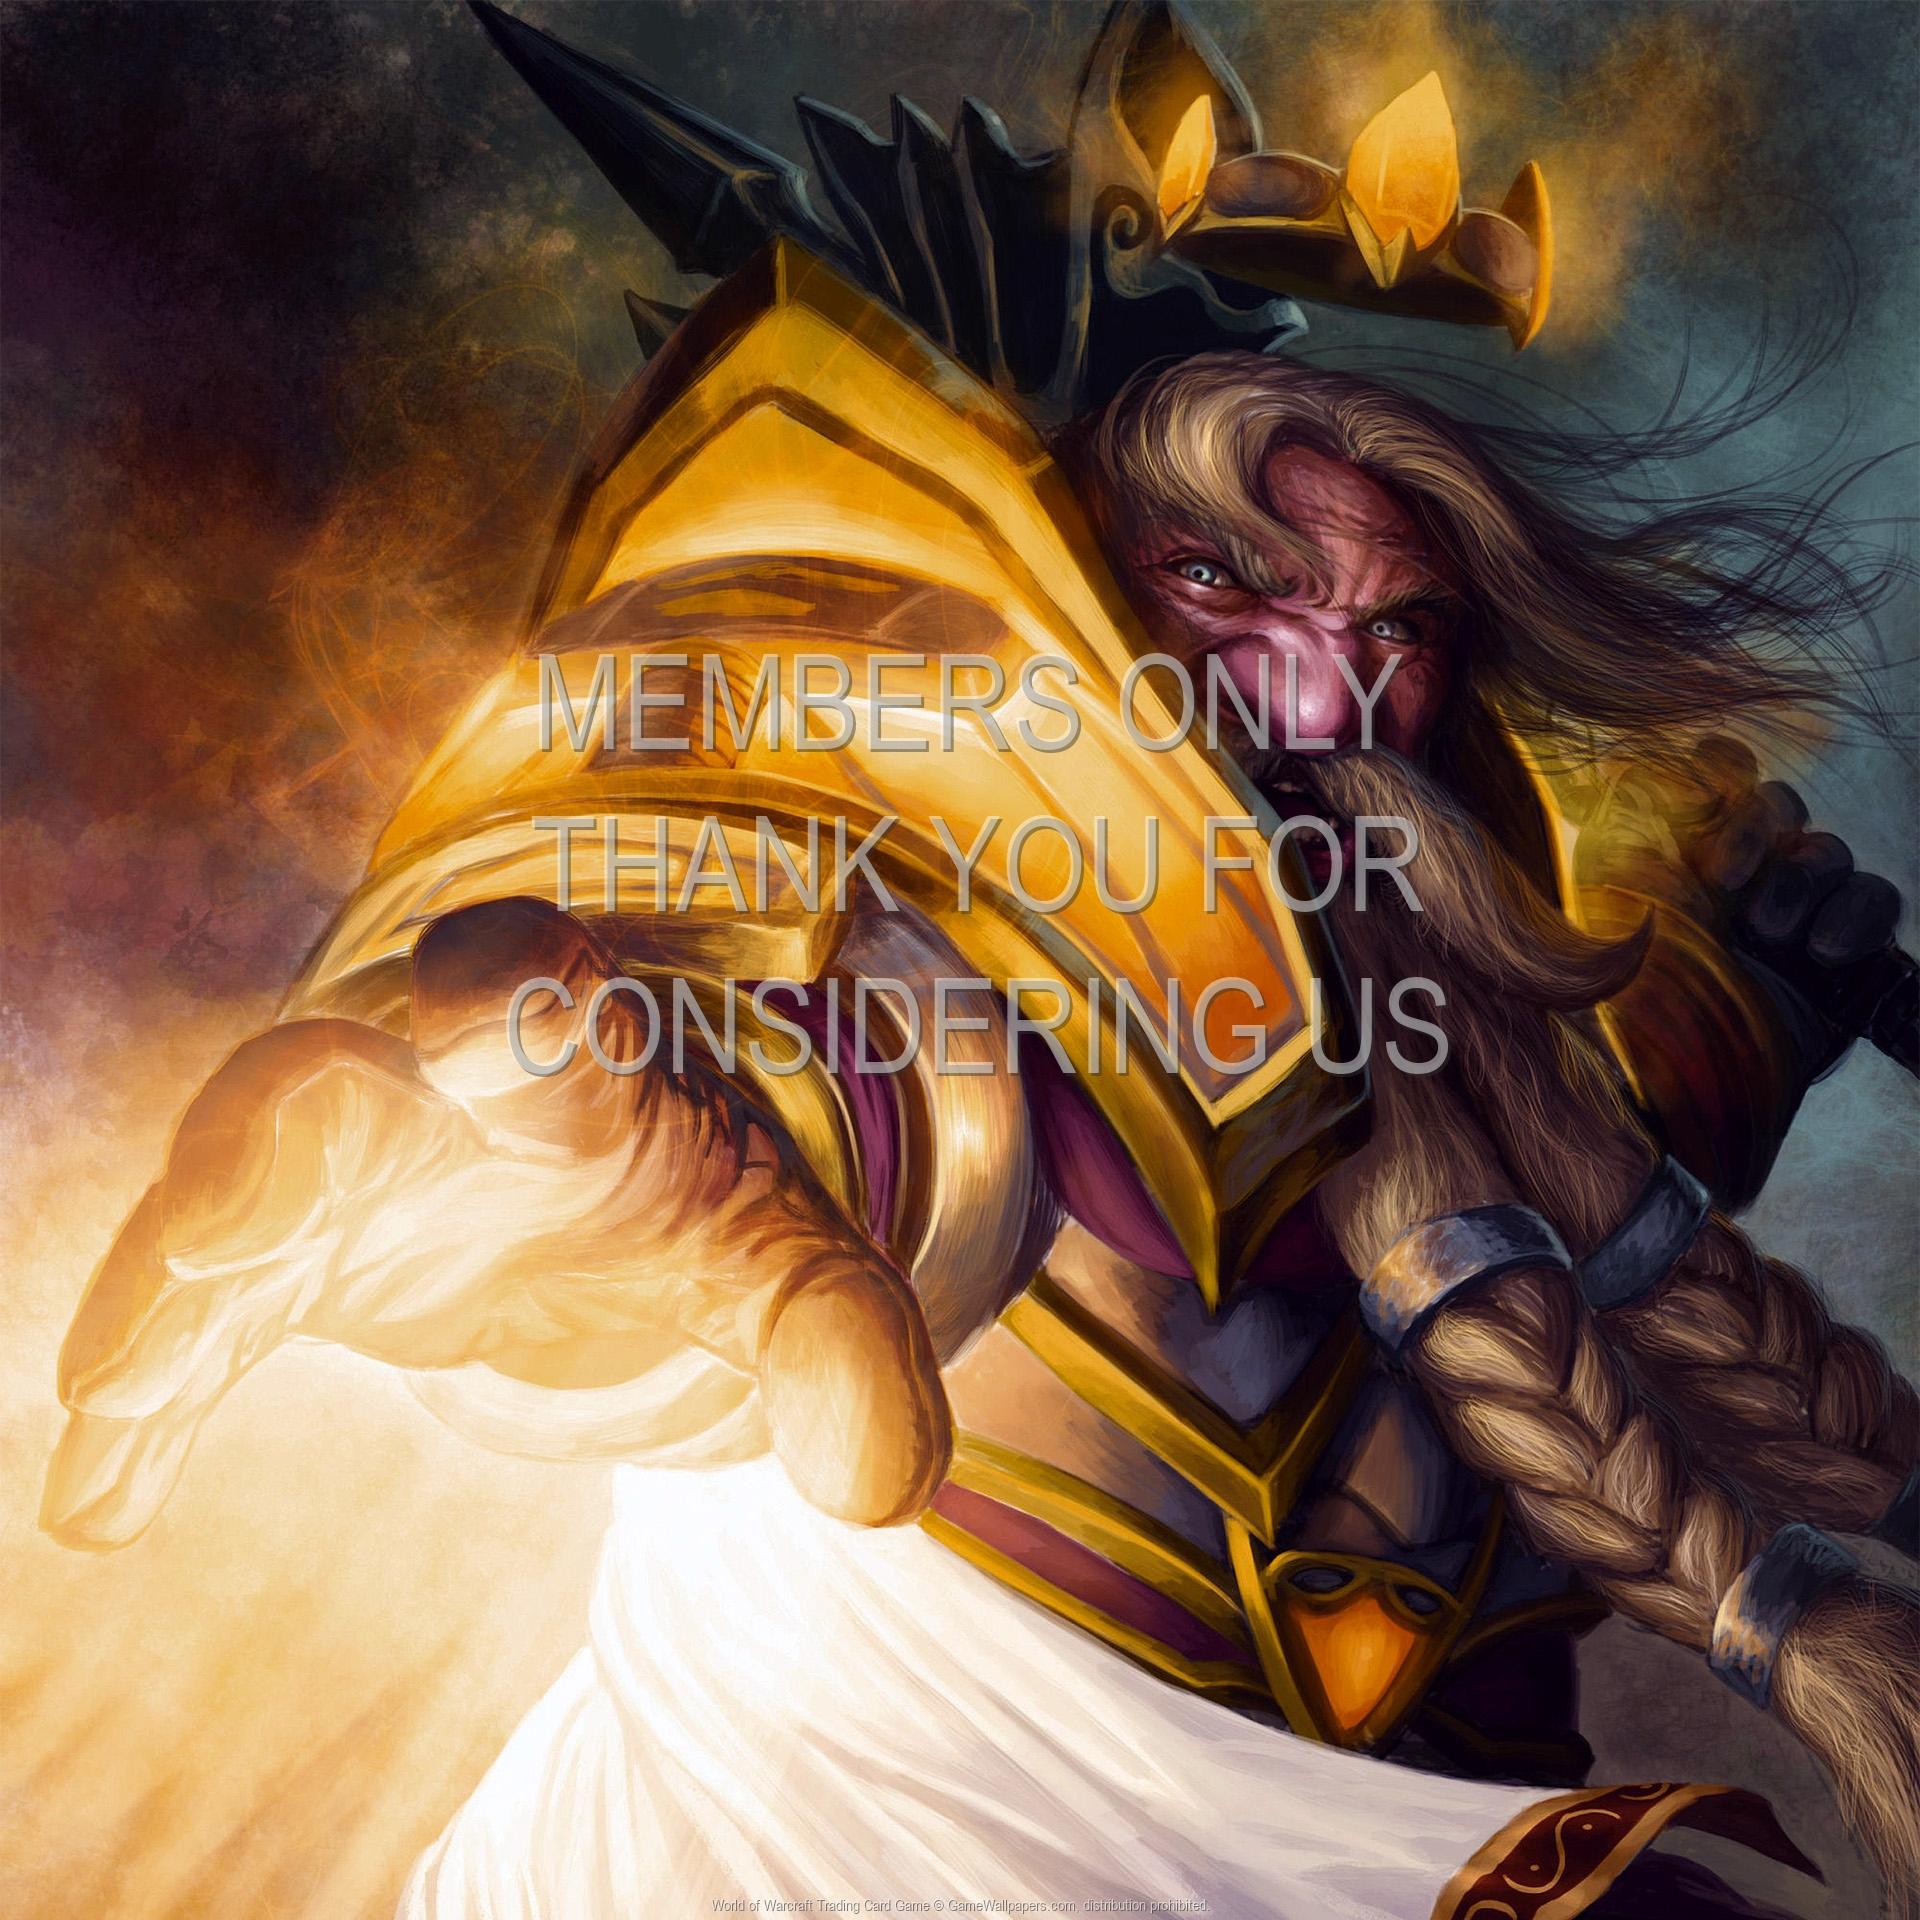 World of Warcraft: Trading Card Game 1920x1080 Handy Hintergrundbild 35